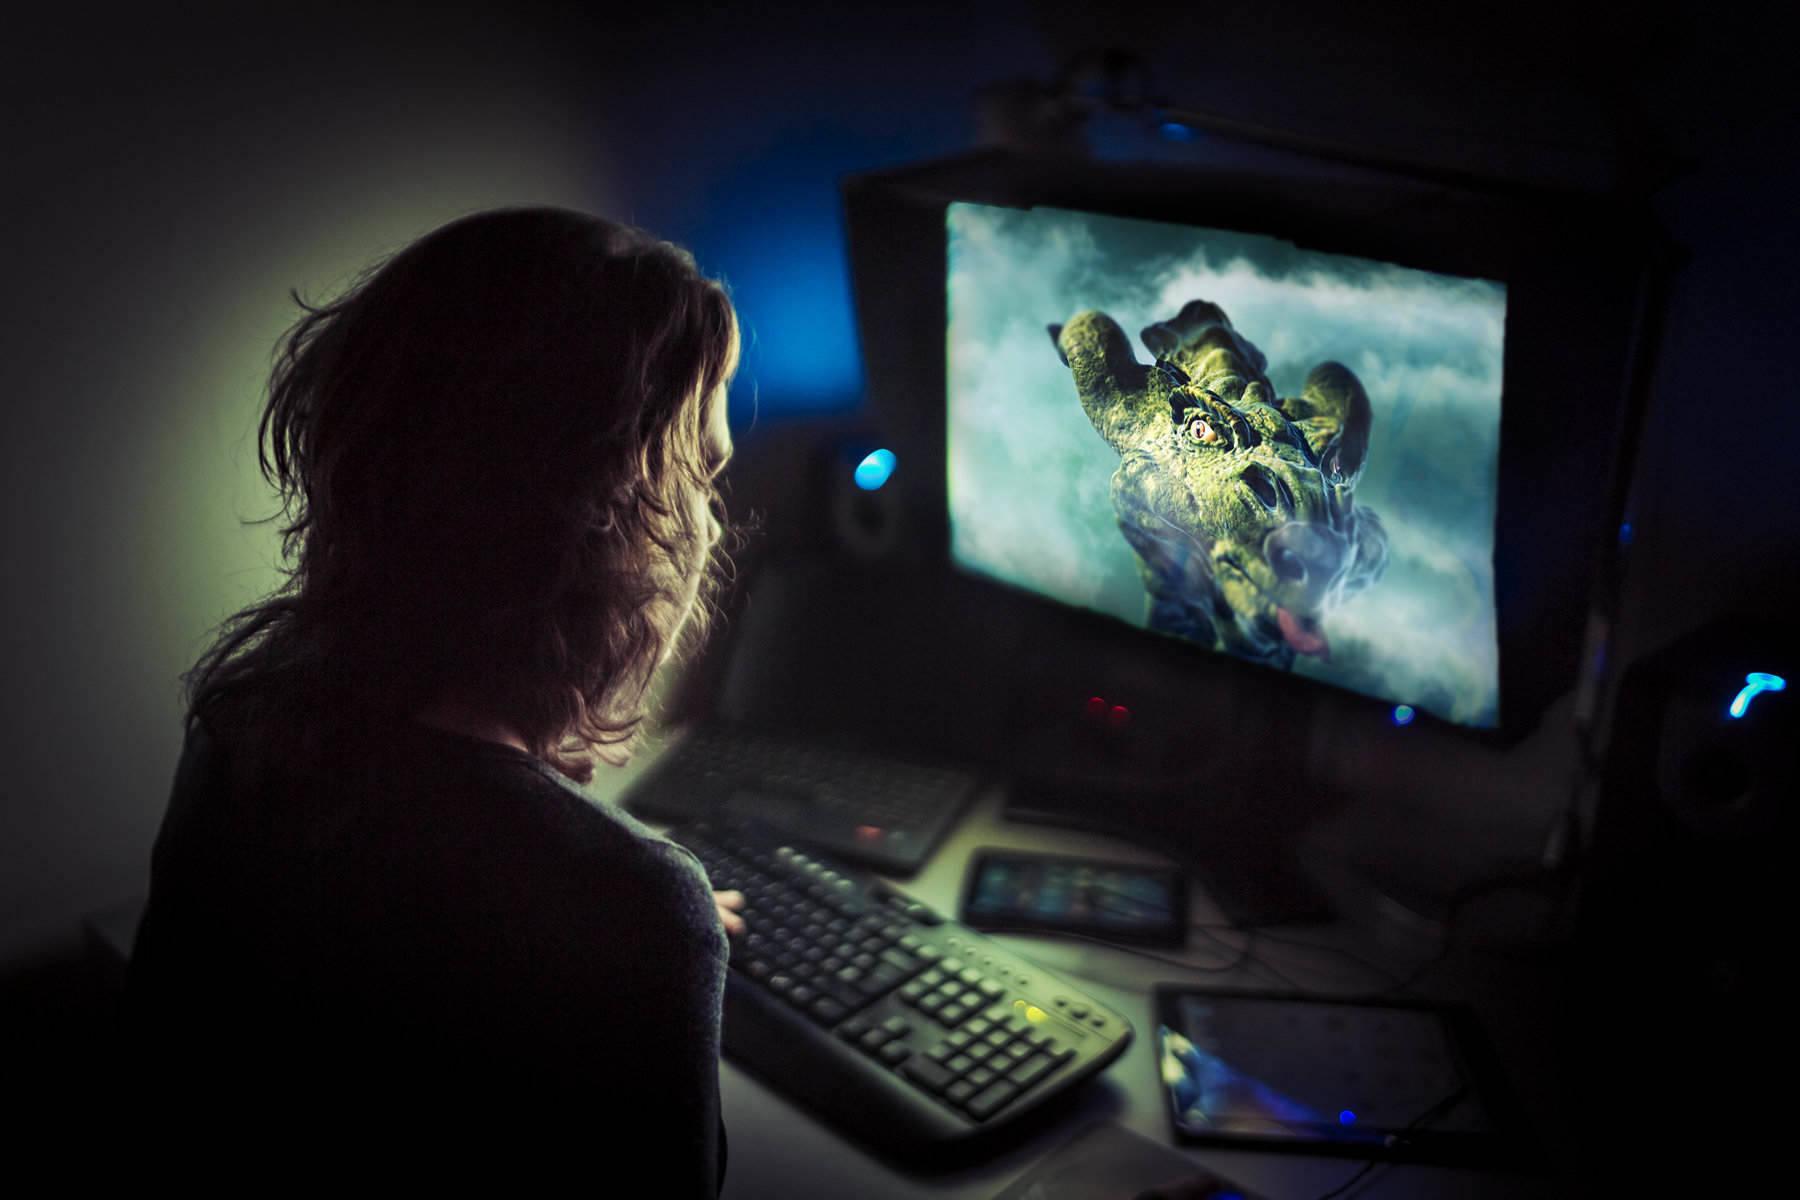 Girl playing browser game